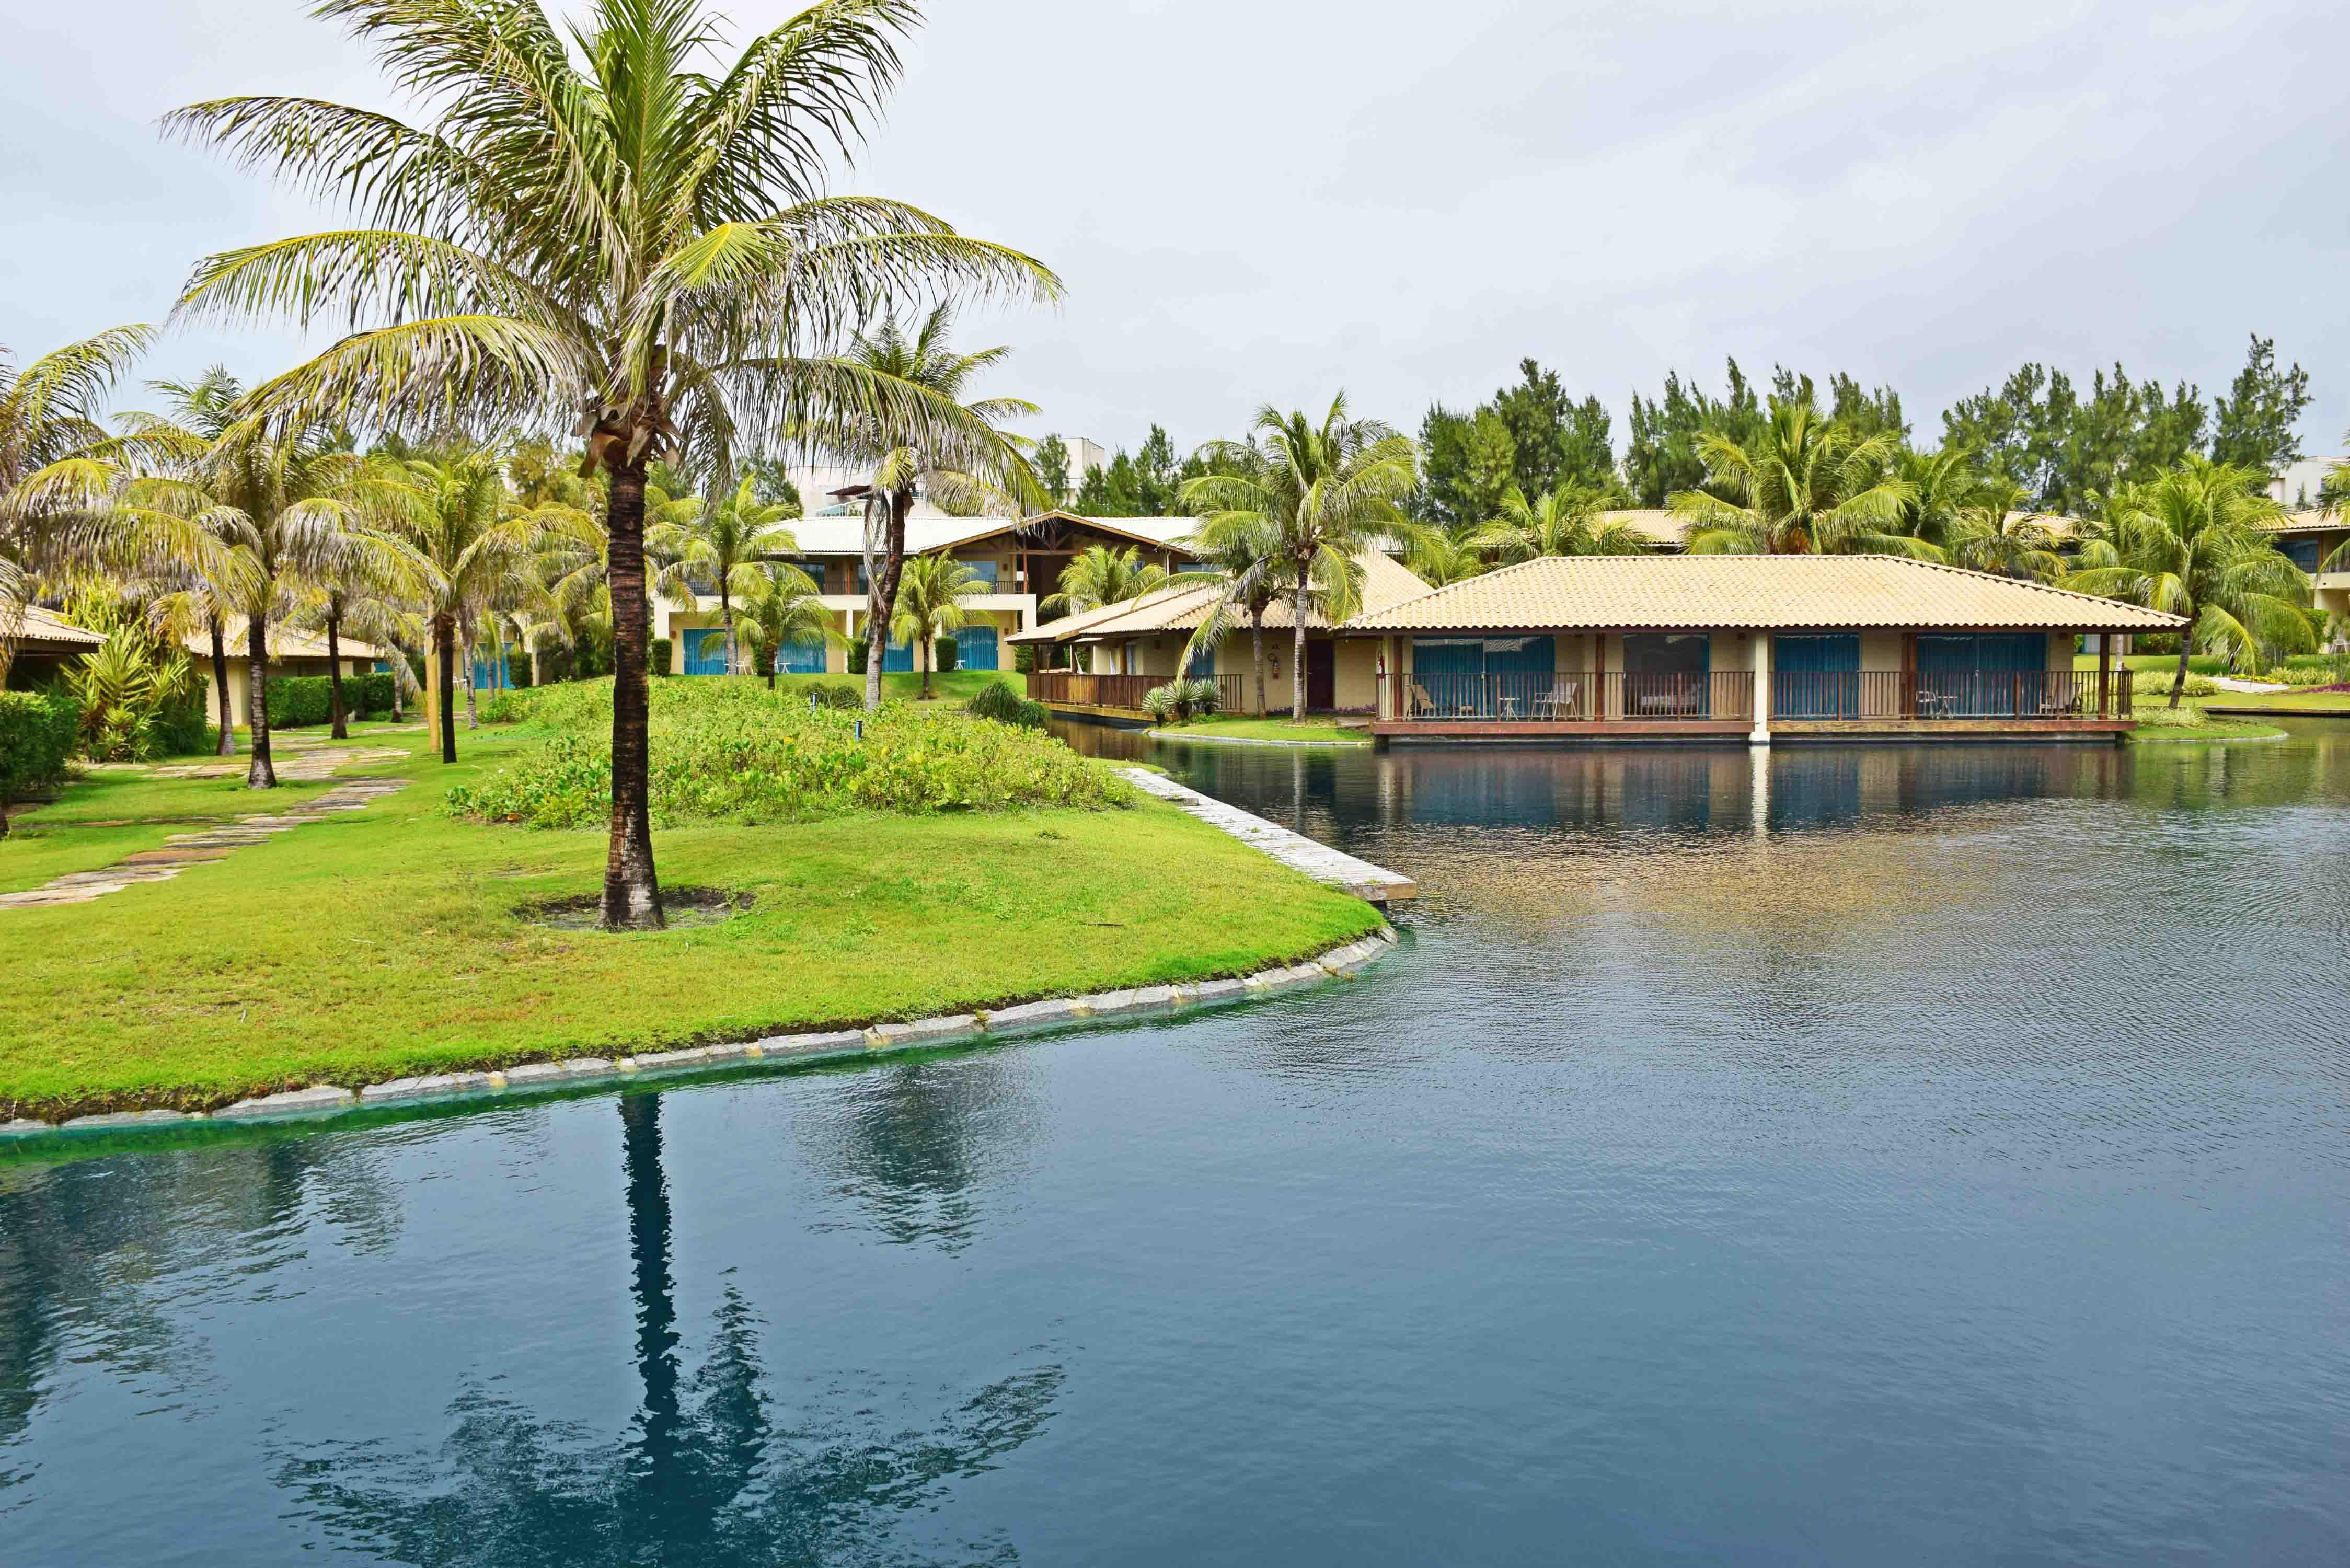 hotel dom pedro laguna ceara aquiraz bangalos